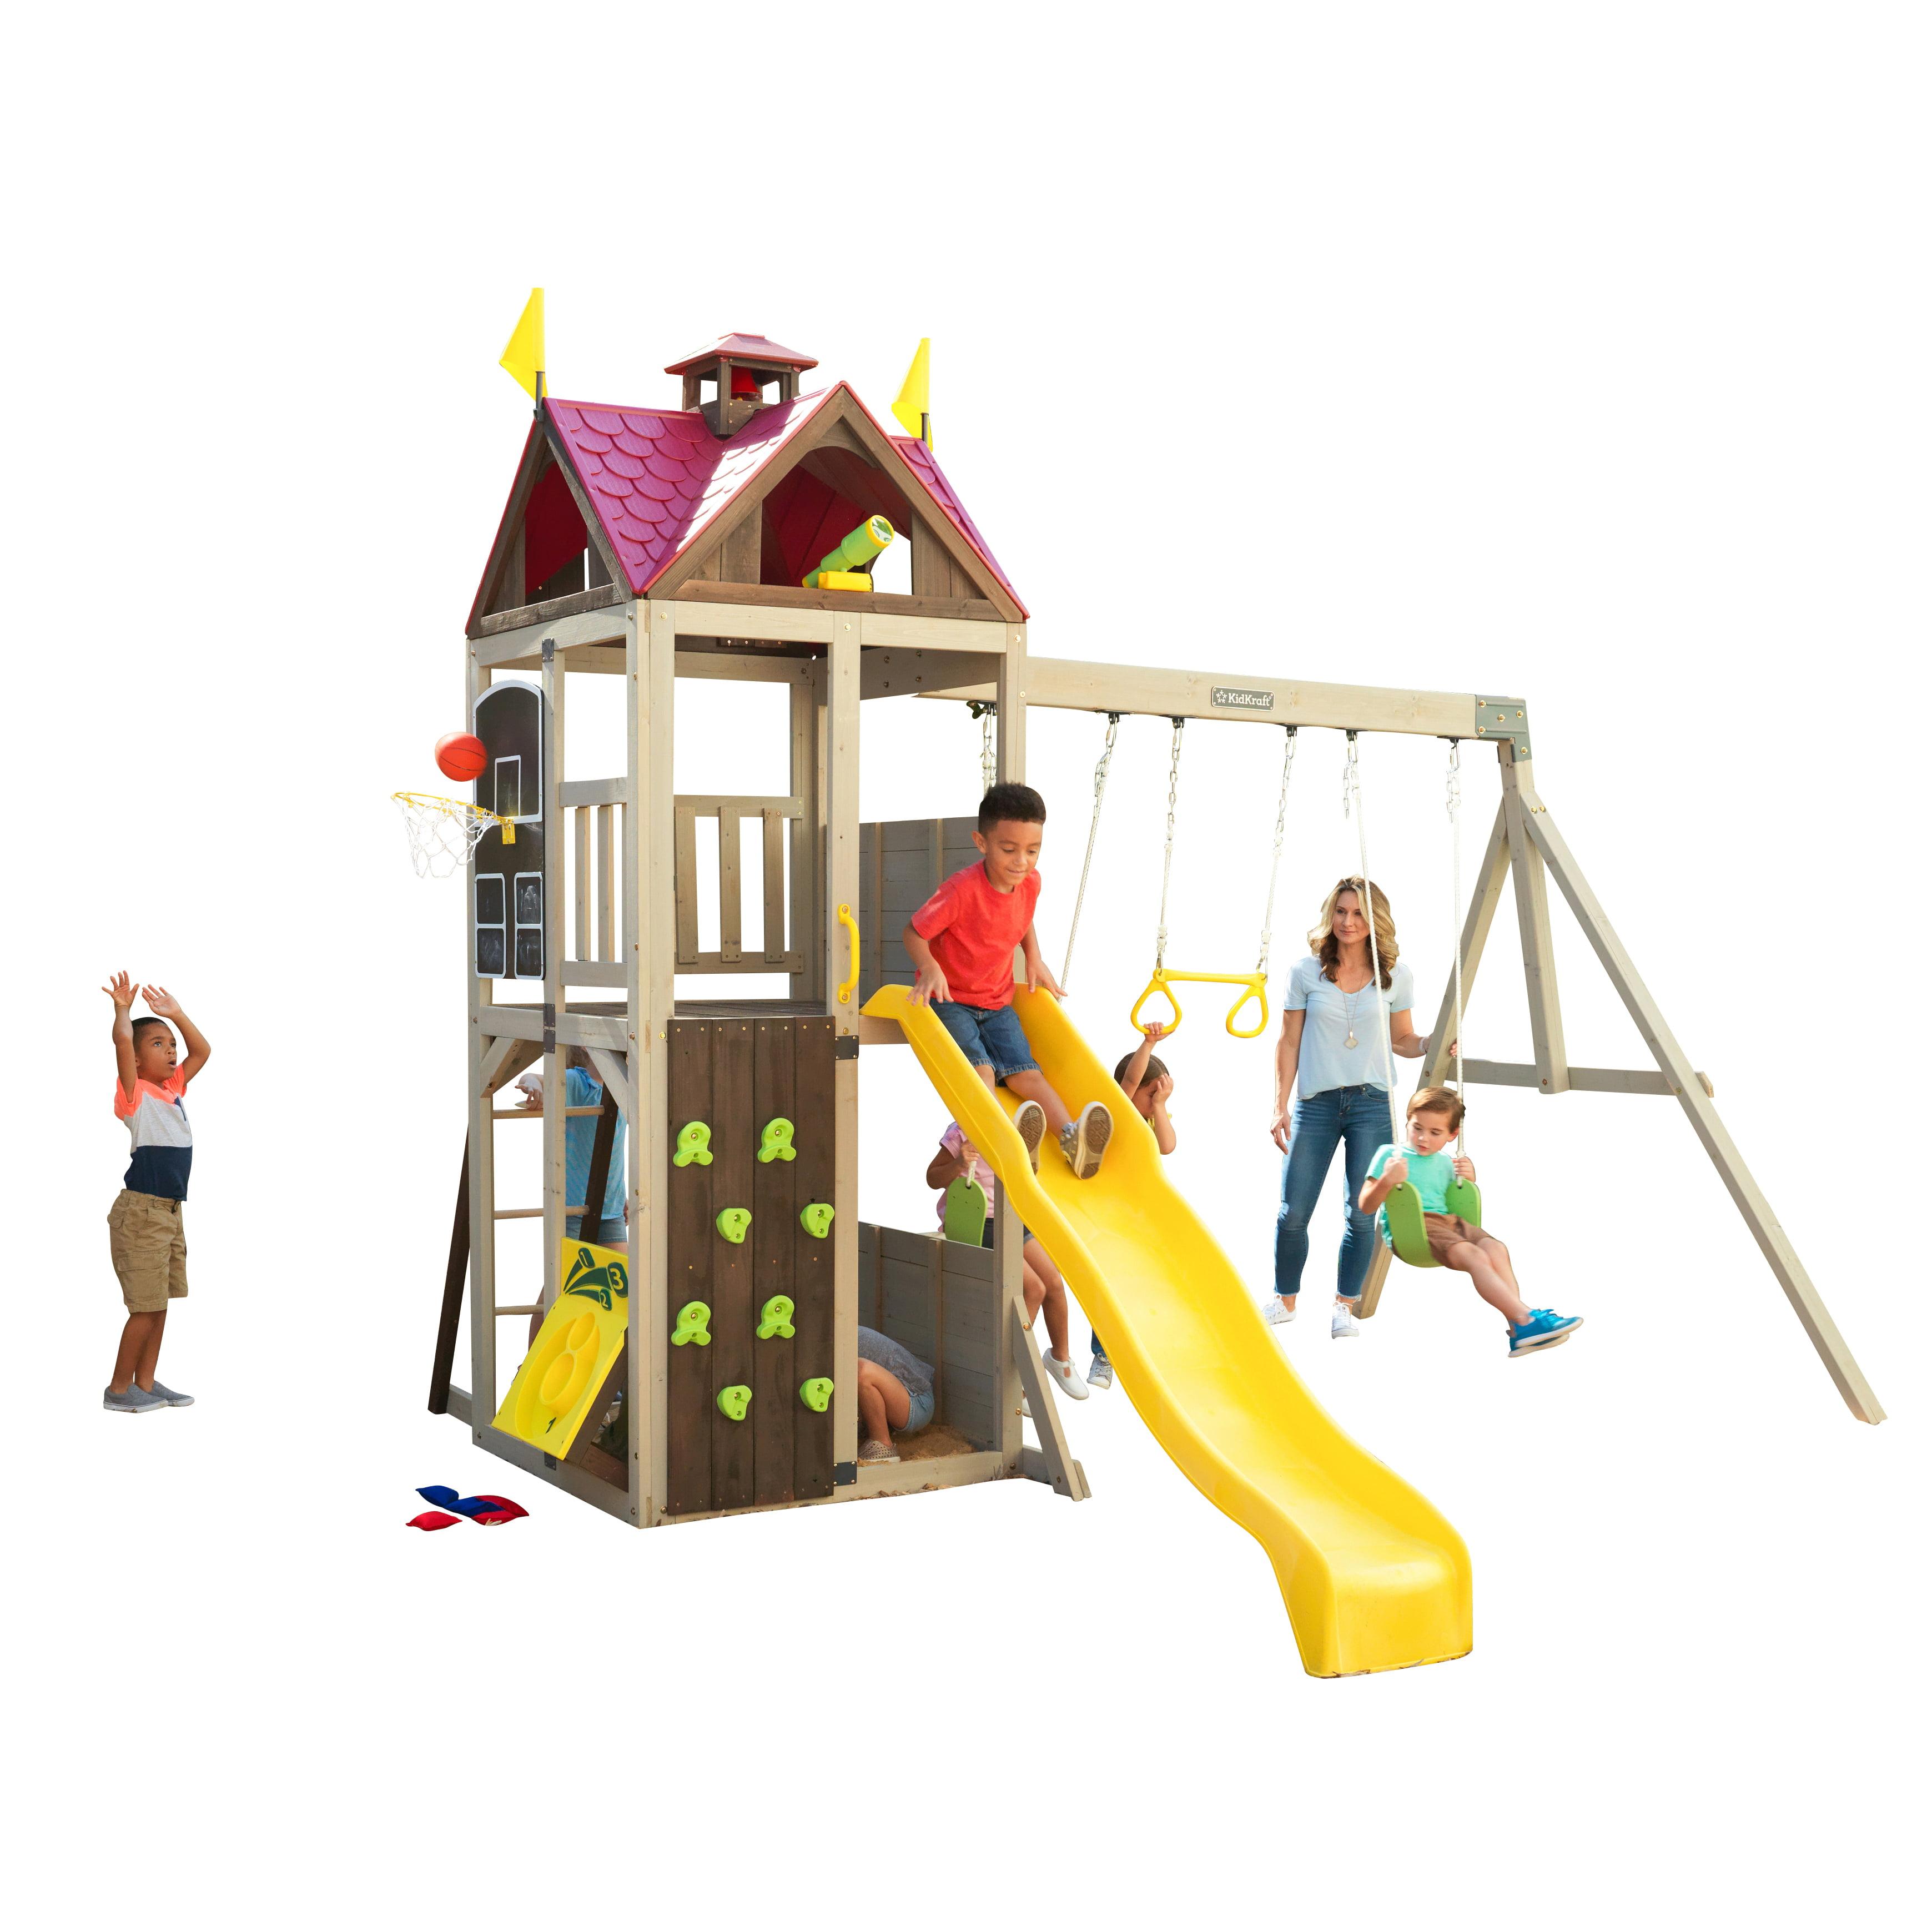 Nerd wars kates star playground